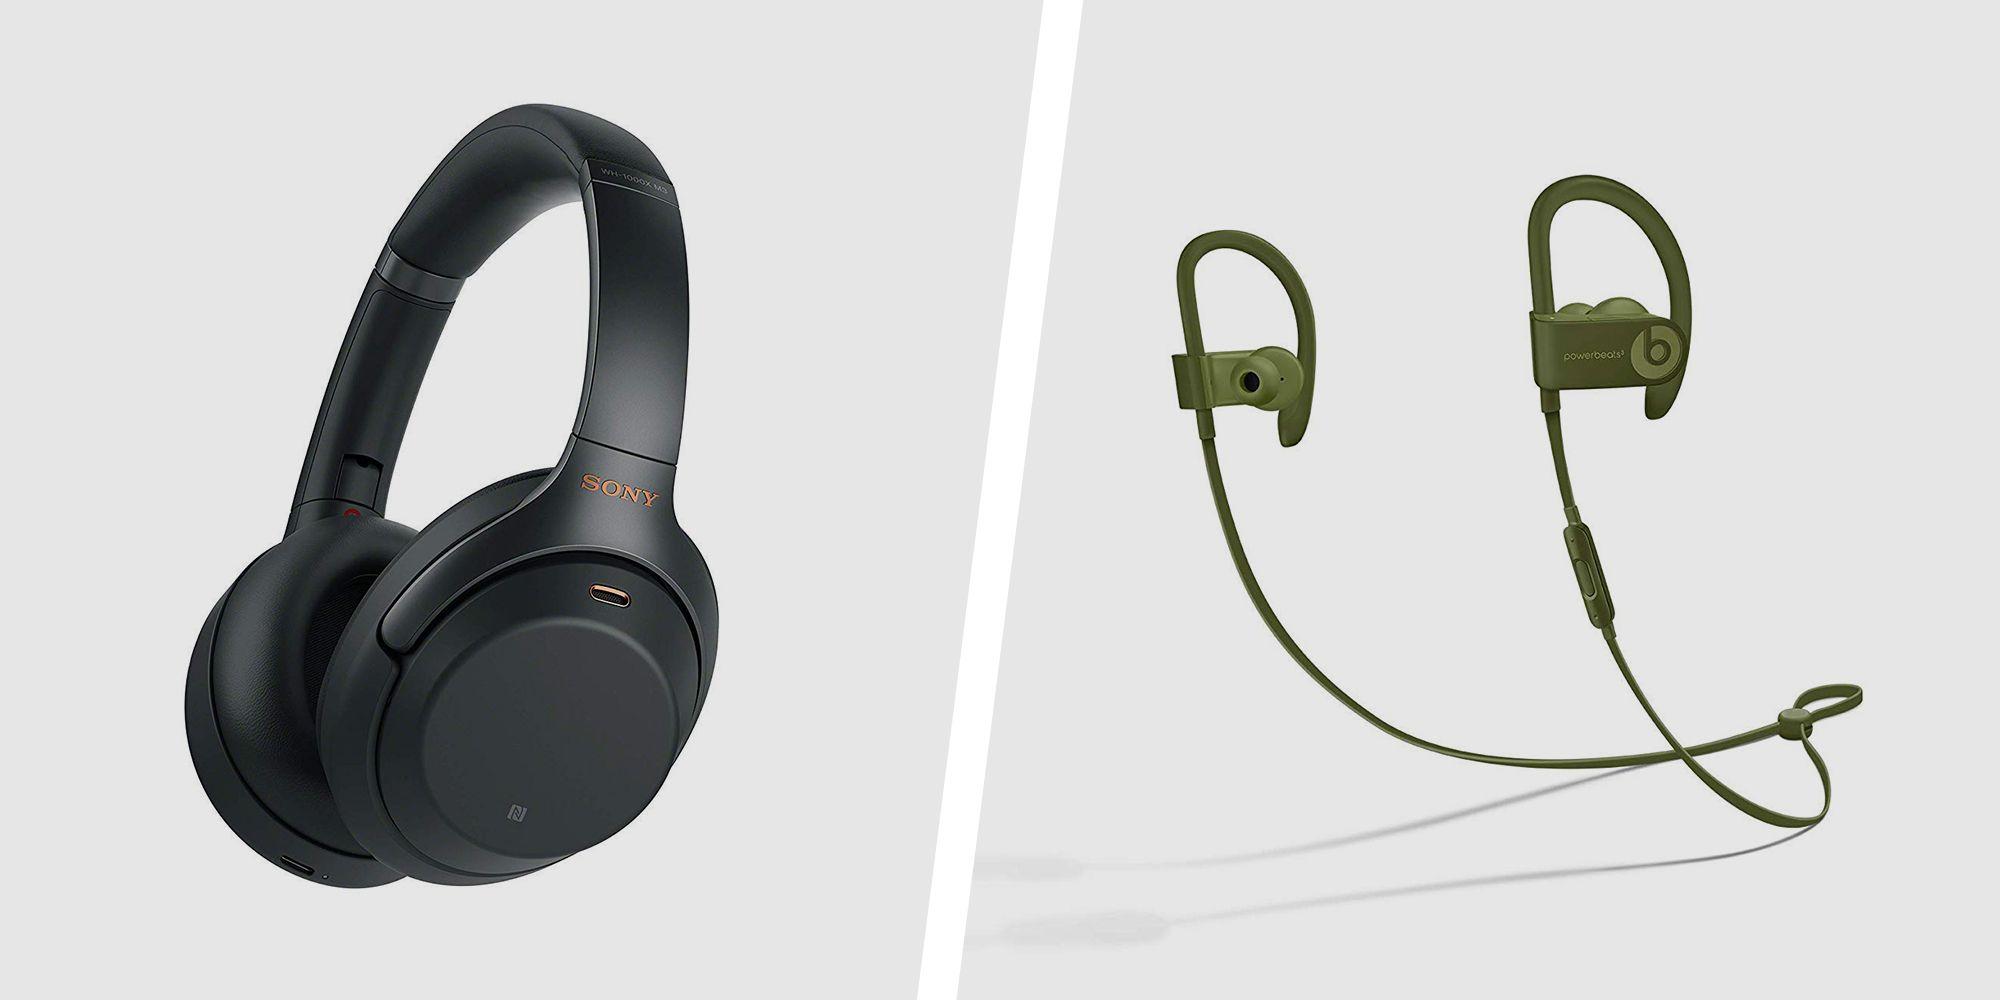 Amazon Prime Day Has Huge Deals on Top-Rated Wireless Headphones